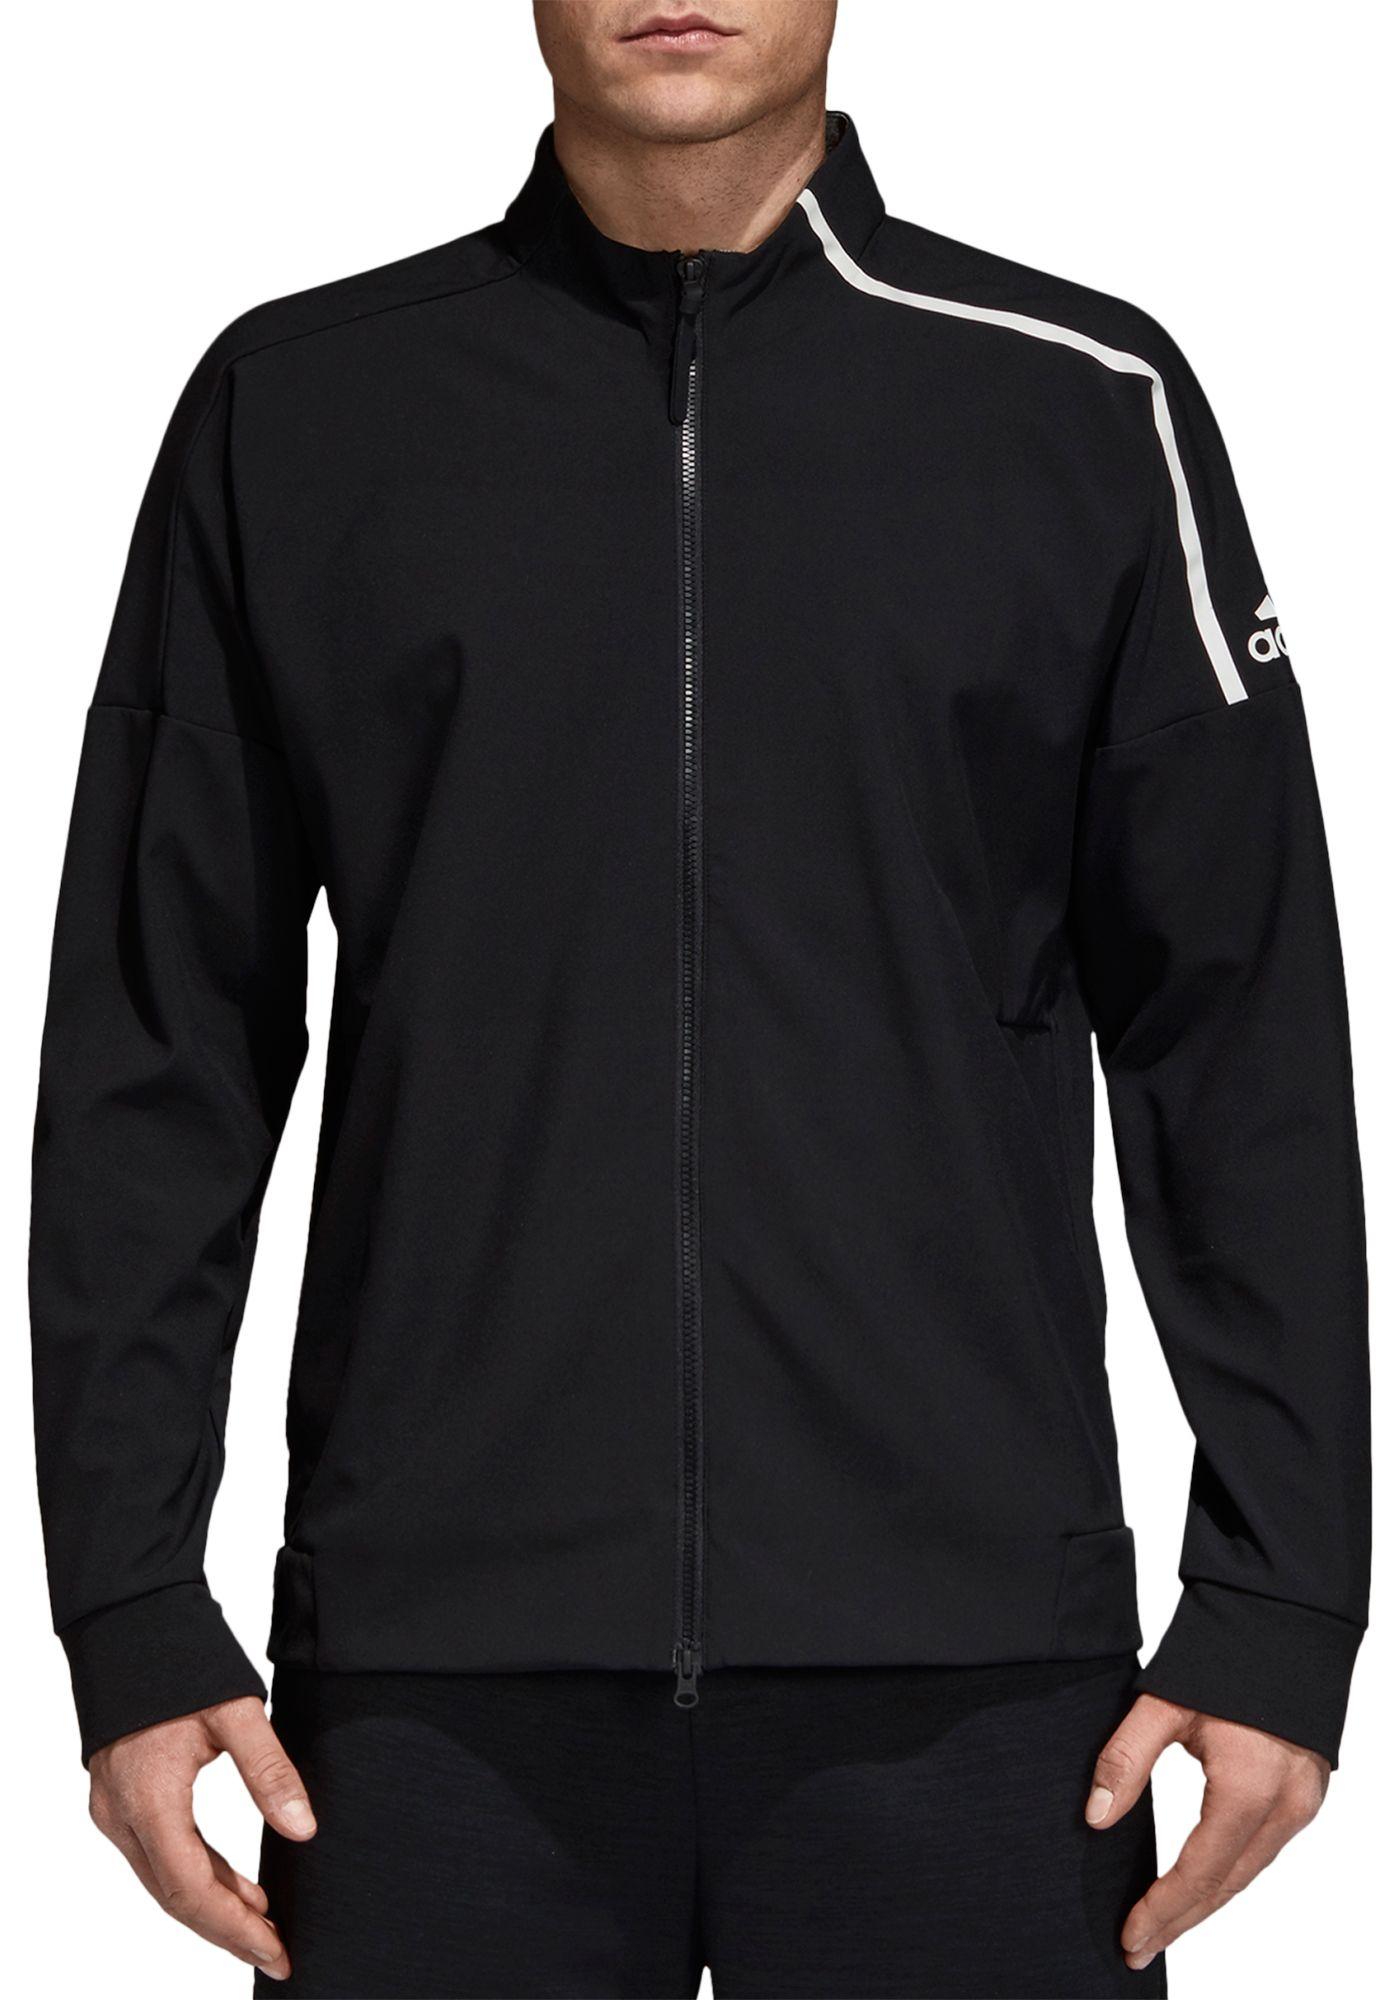 adidas Men's Z.N.E. Track Jacket